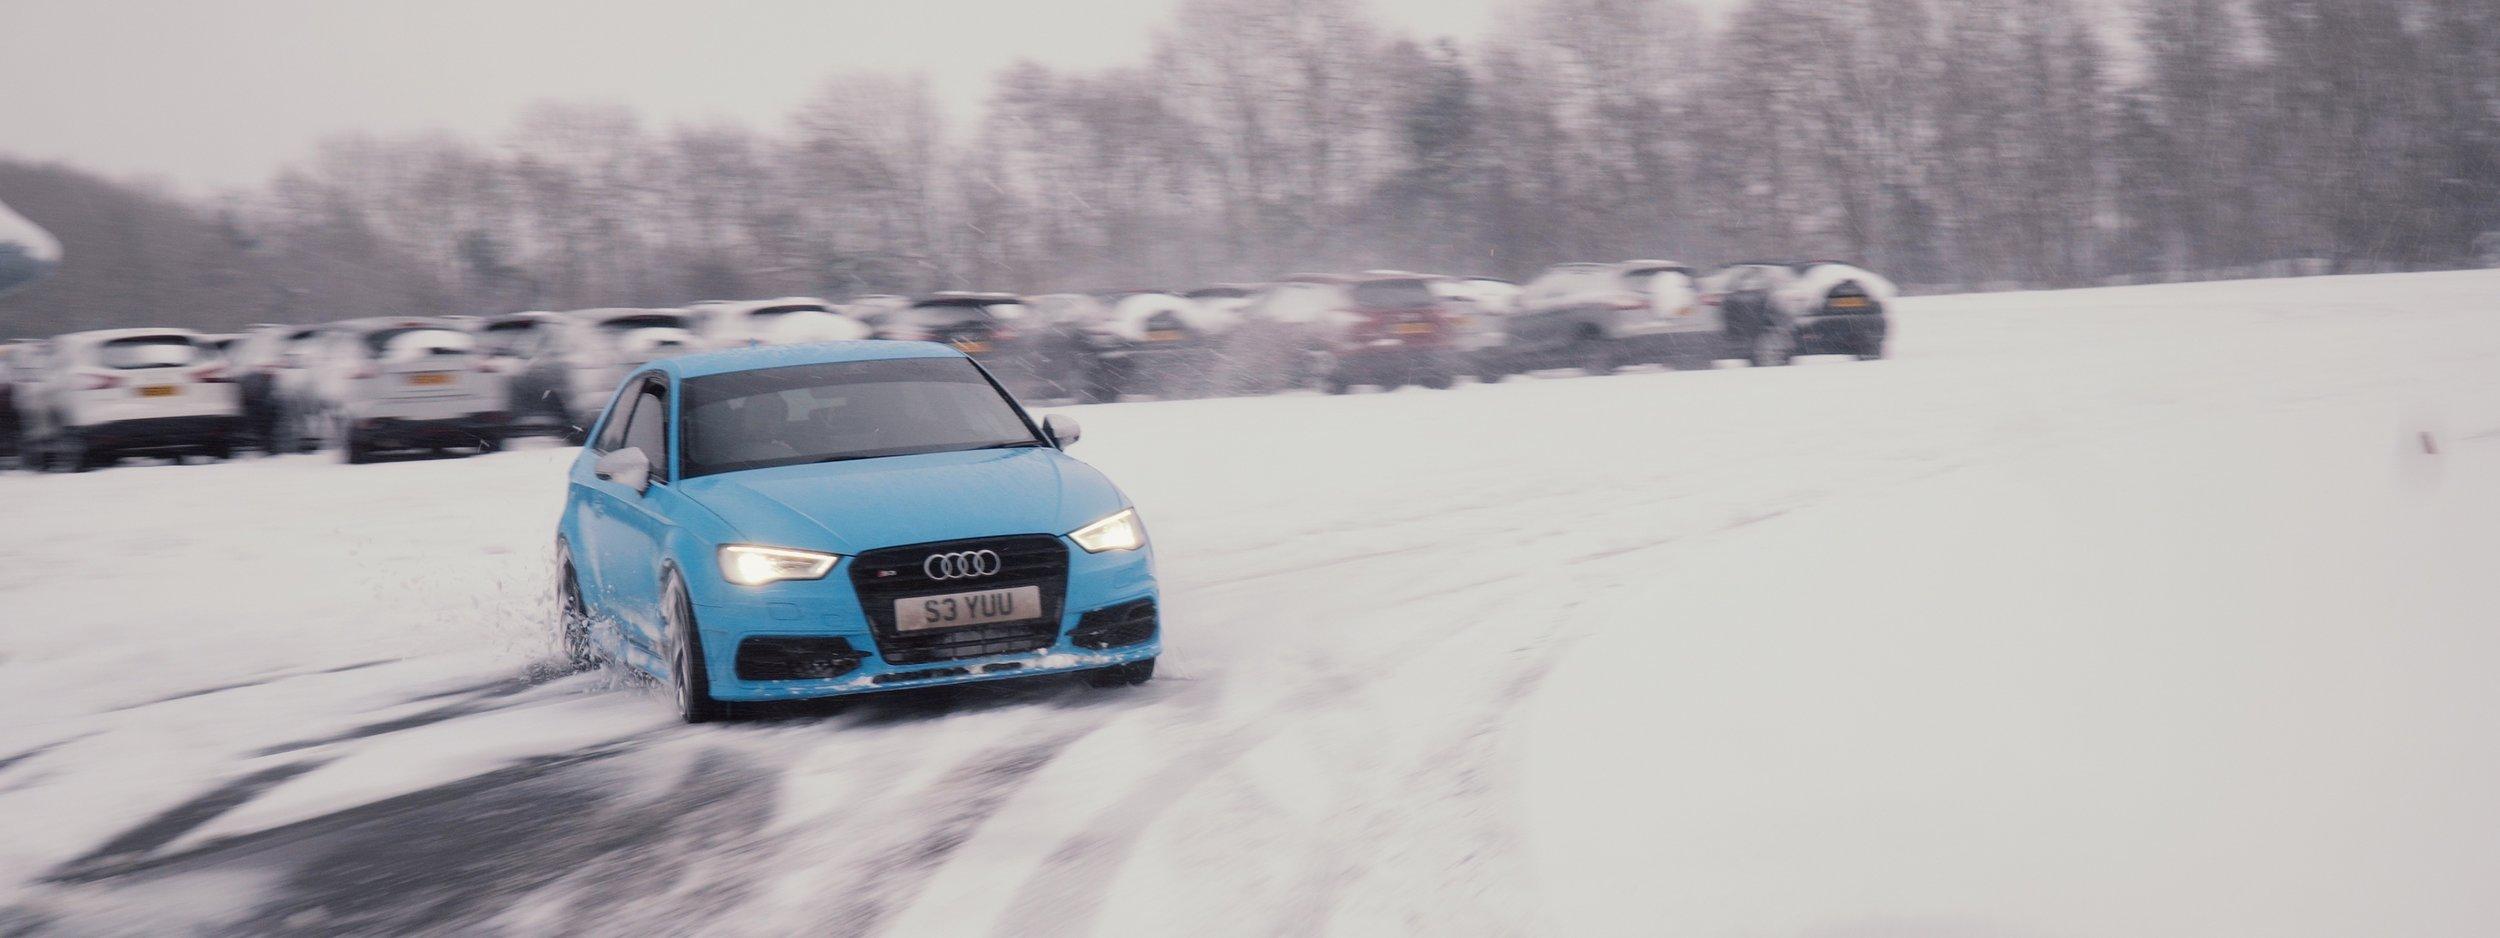 MMR AUDI S3 | SNOW DAY sc7.jpg